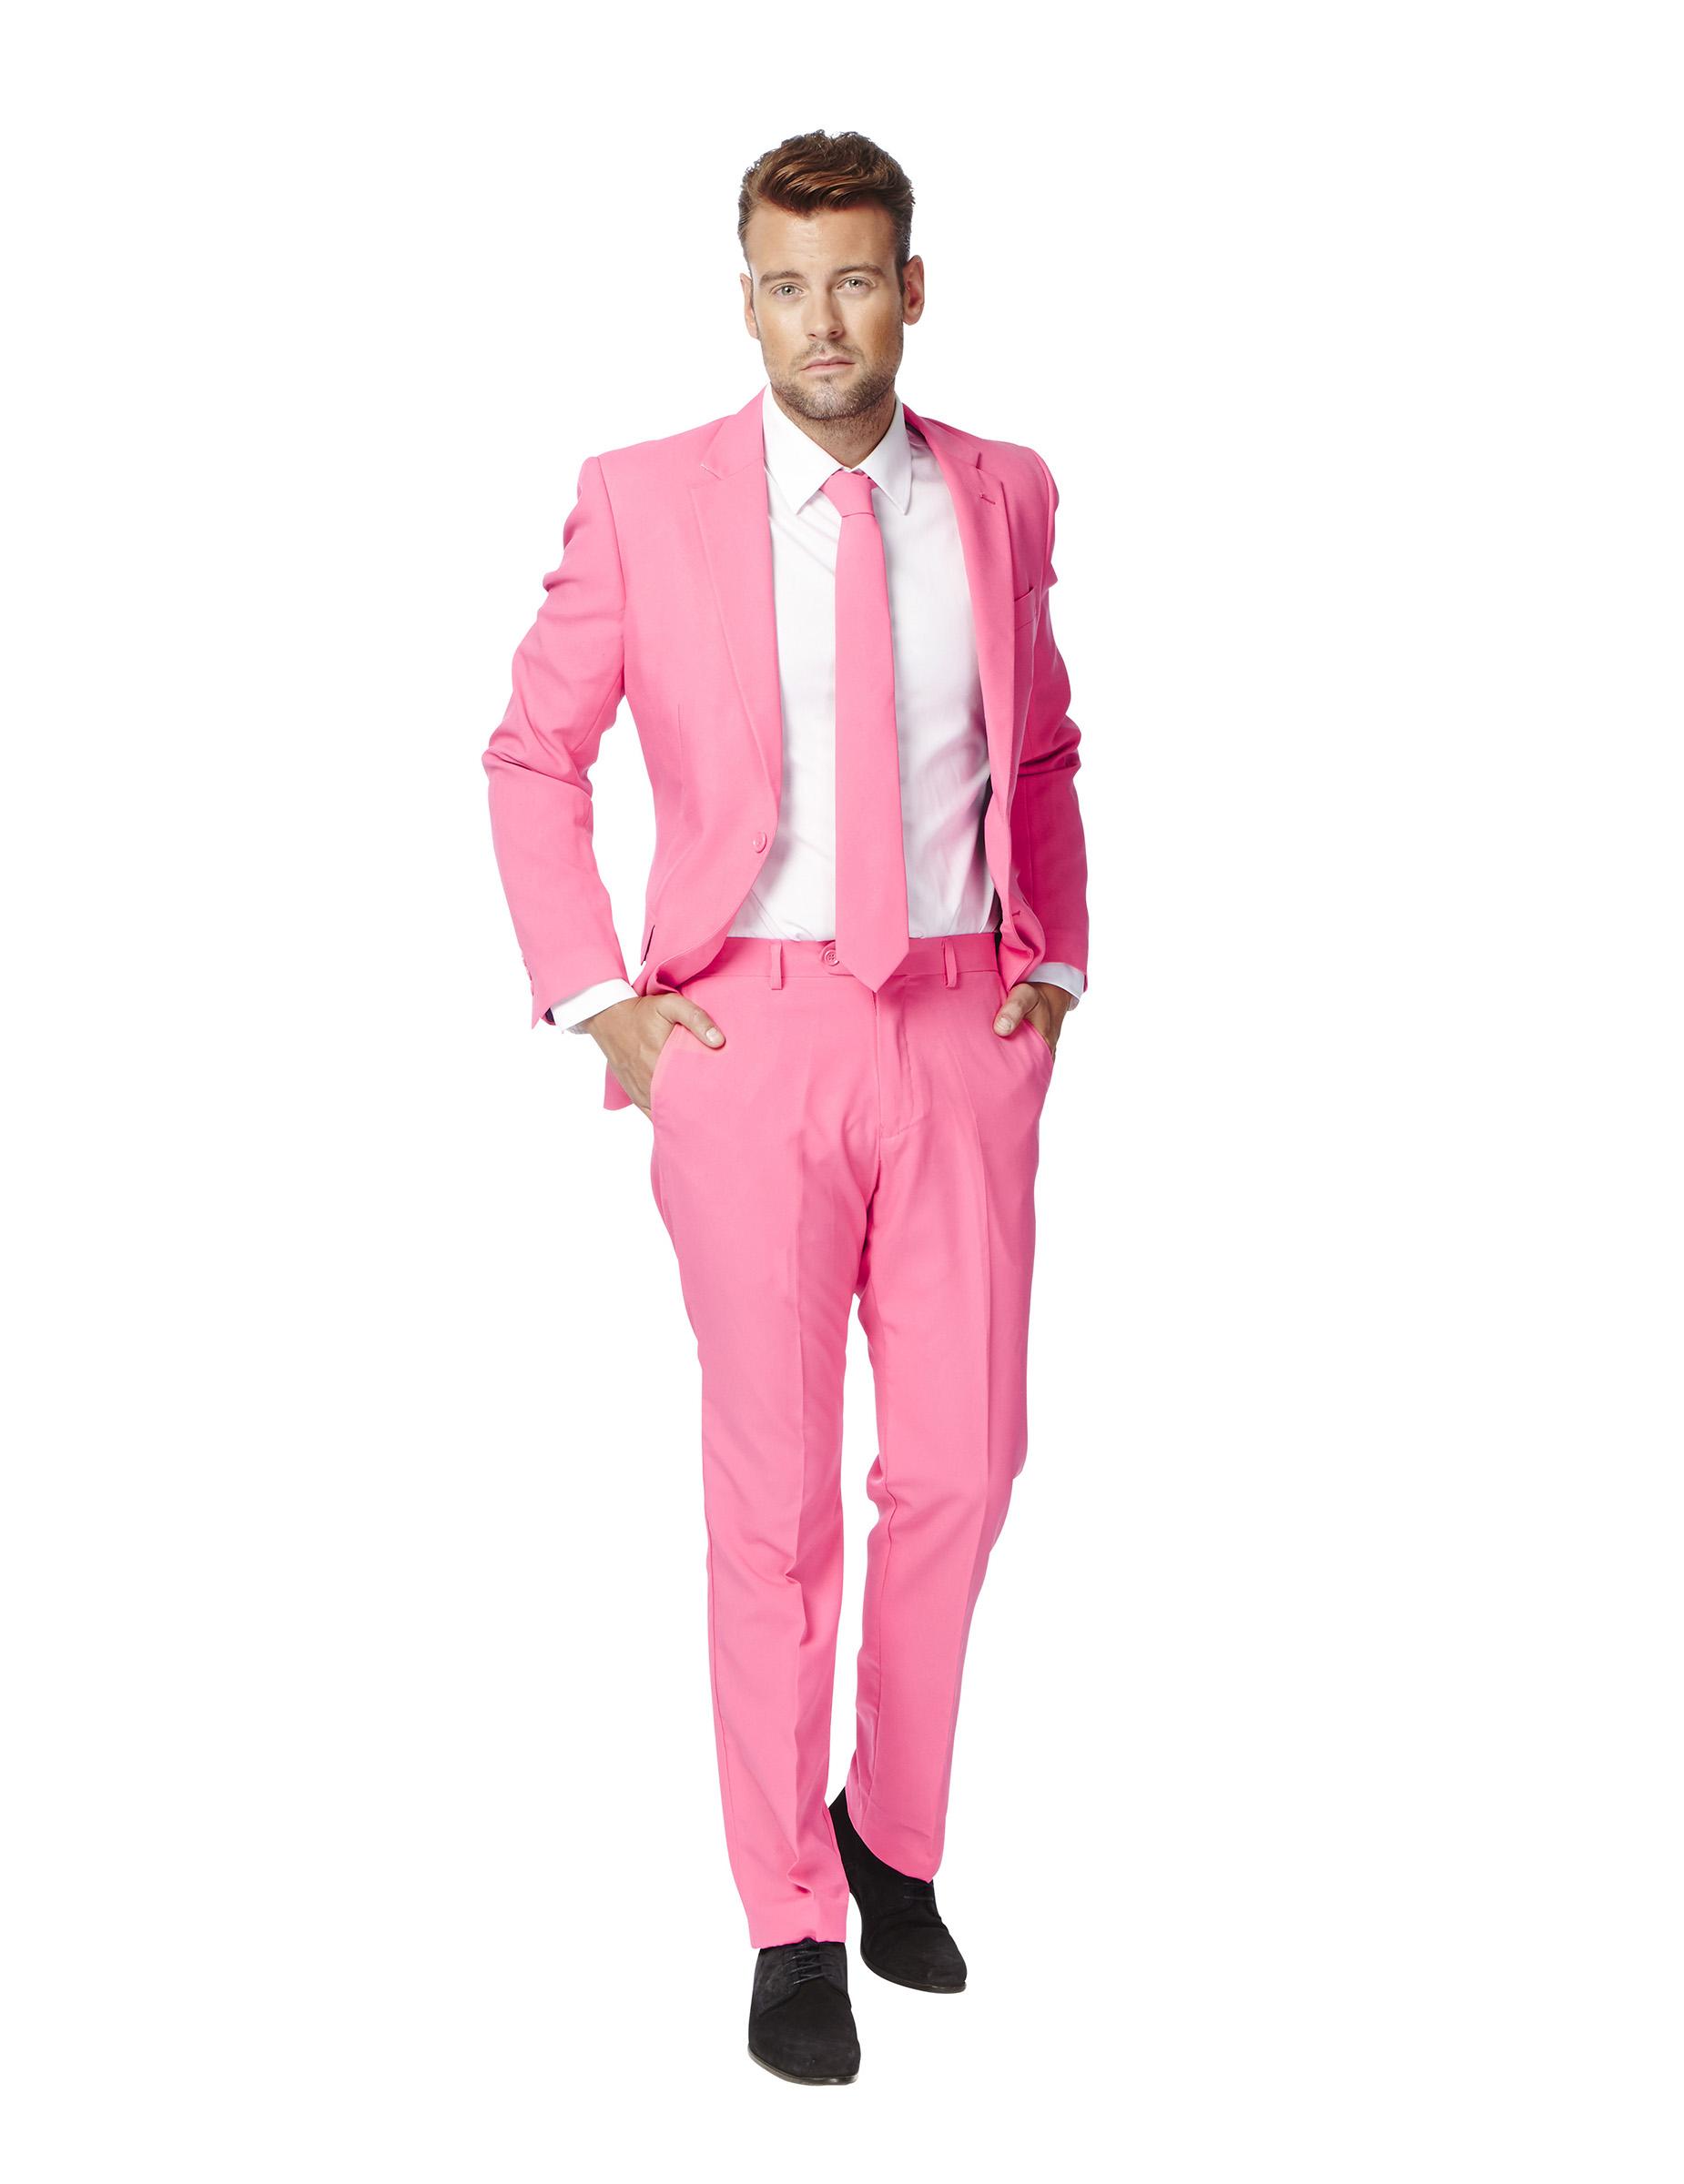 costume mr pink homme opposuits deguise toi achat de d guisements adultes. Black Bedroom Furniture Sets. Home Design Ideas